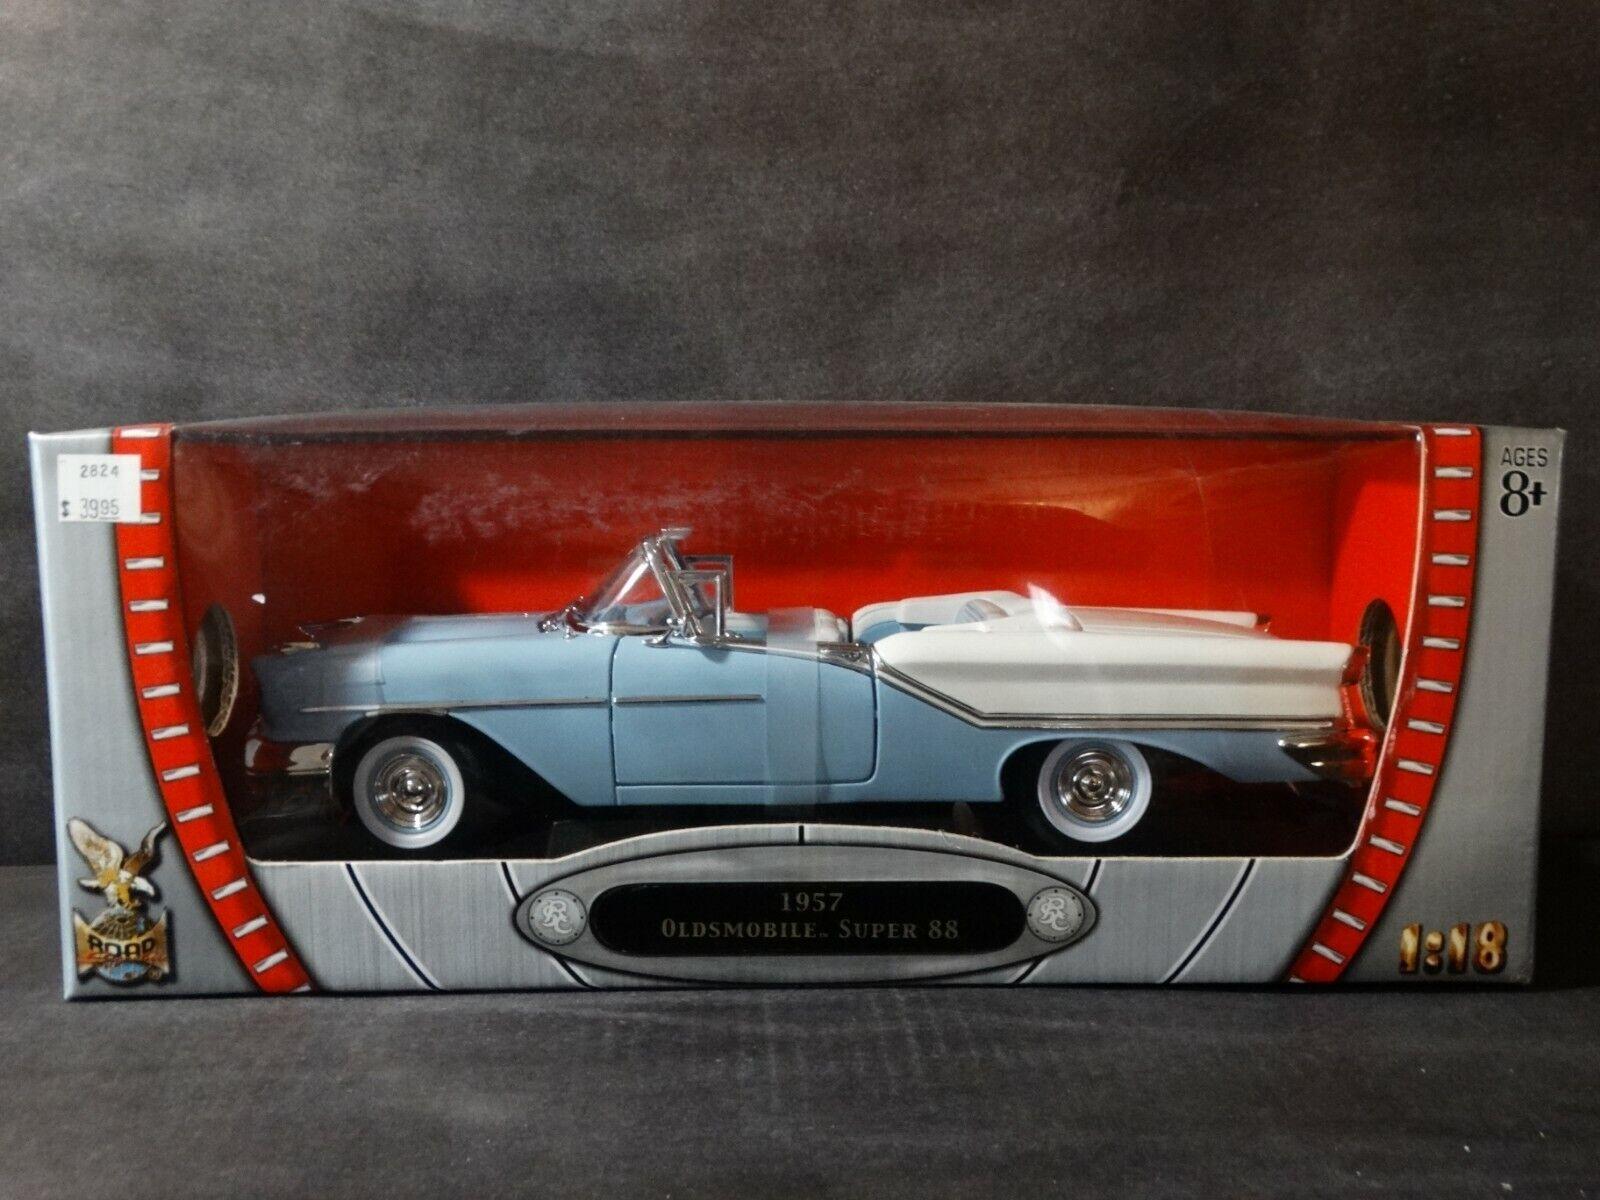 Road Signature 1957 Olds Super 88 Congreeniblle 1 18 Scale Diecast  Model Car